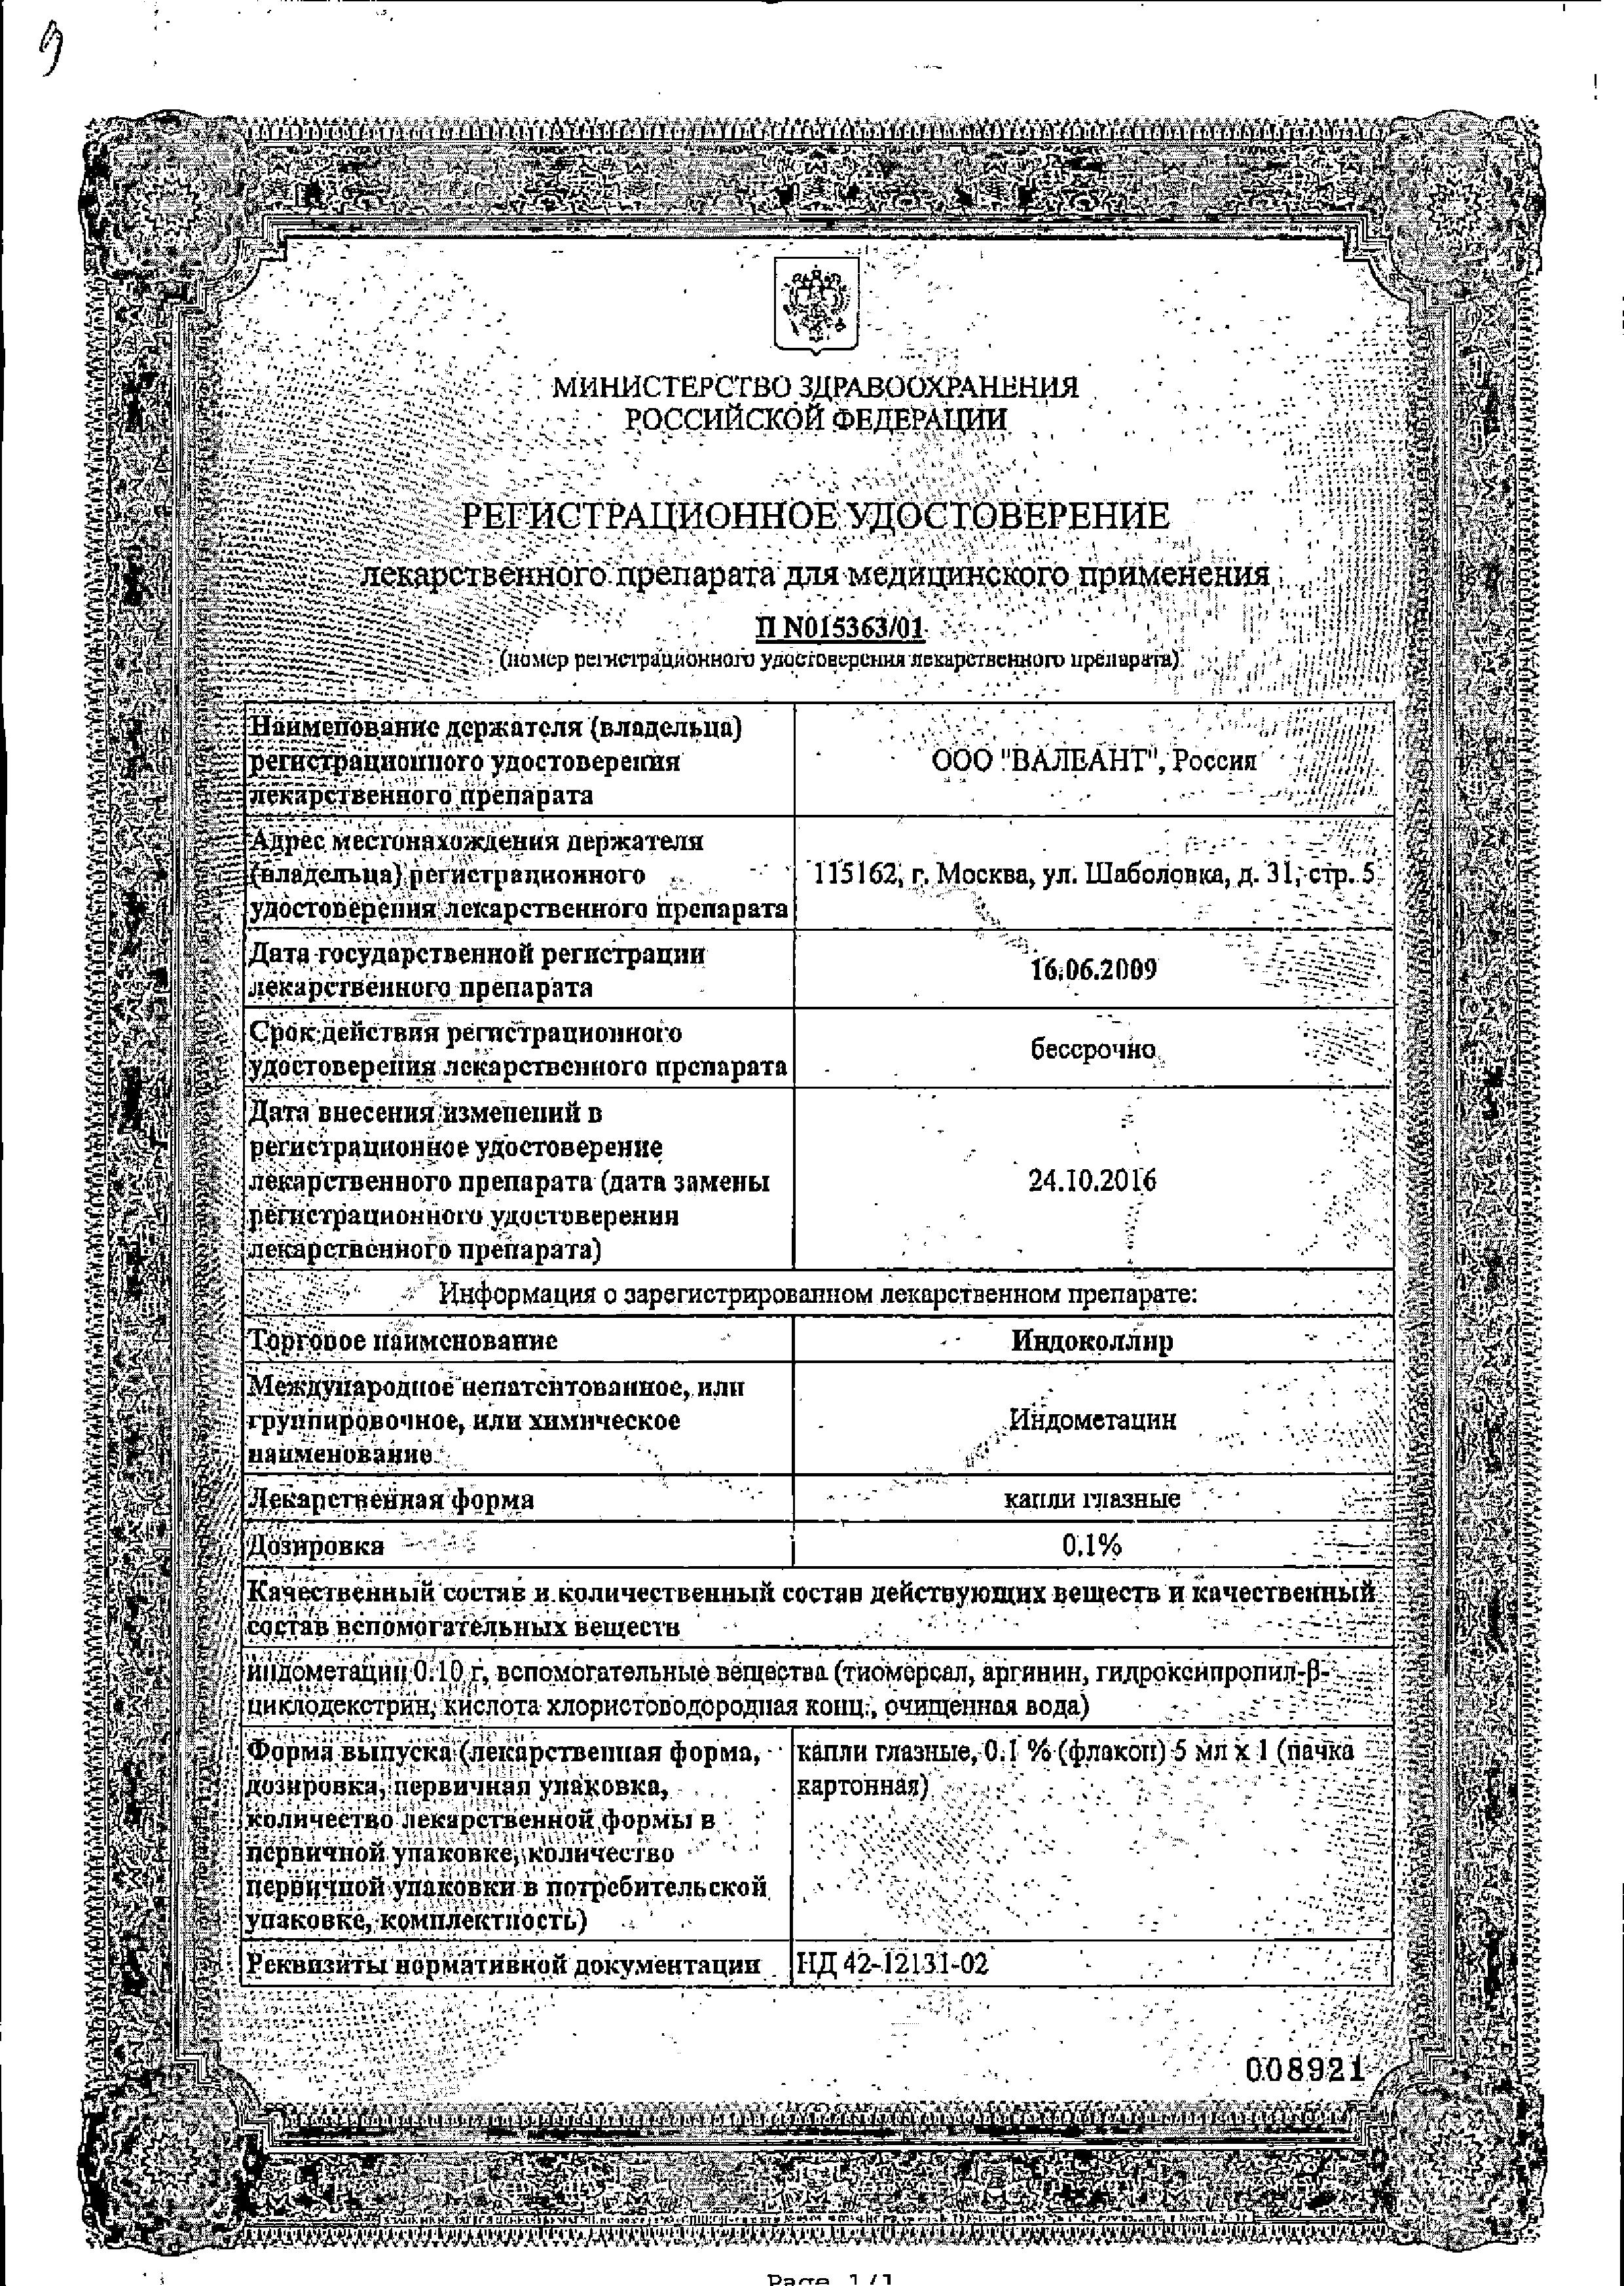 Индоколлир сертификат